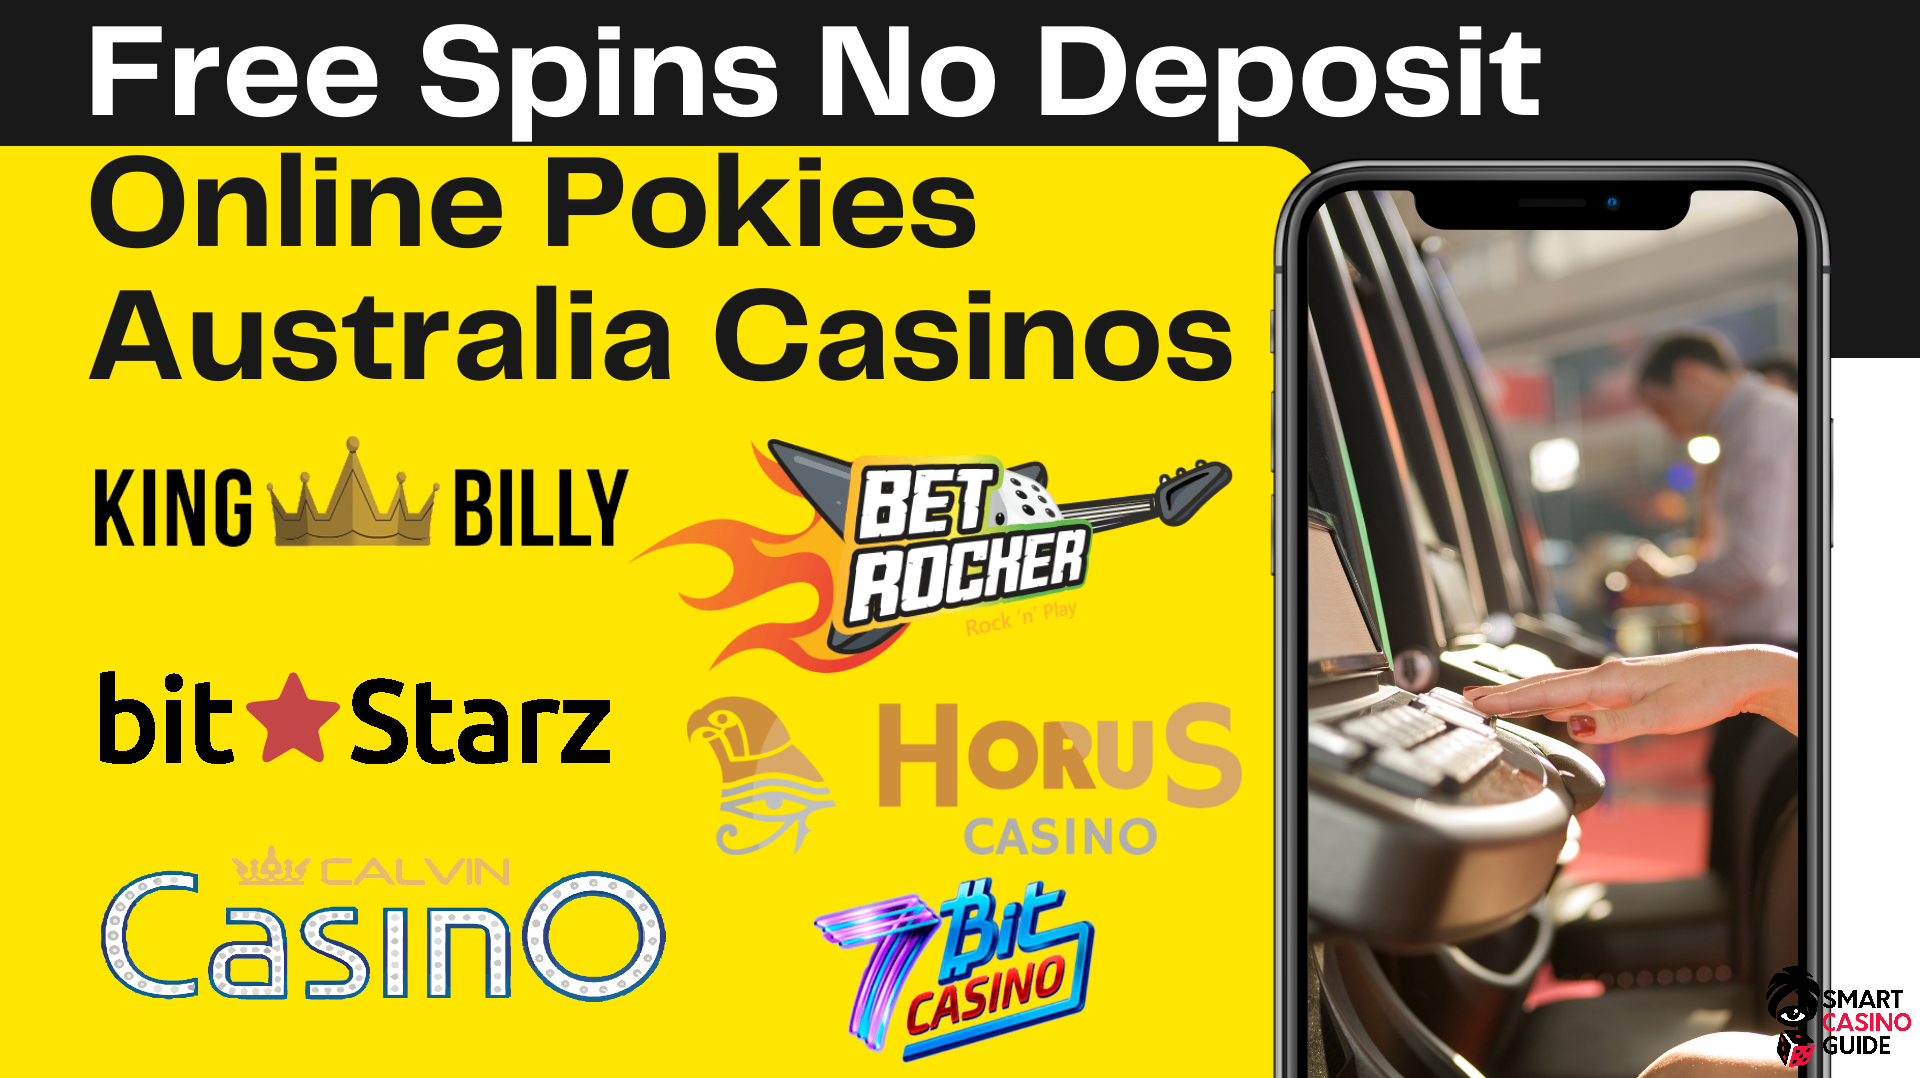 Australian Online Pokies No Deposit Bonus